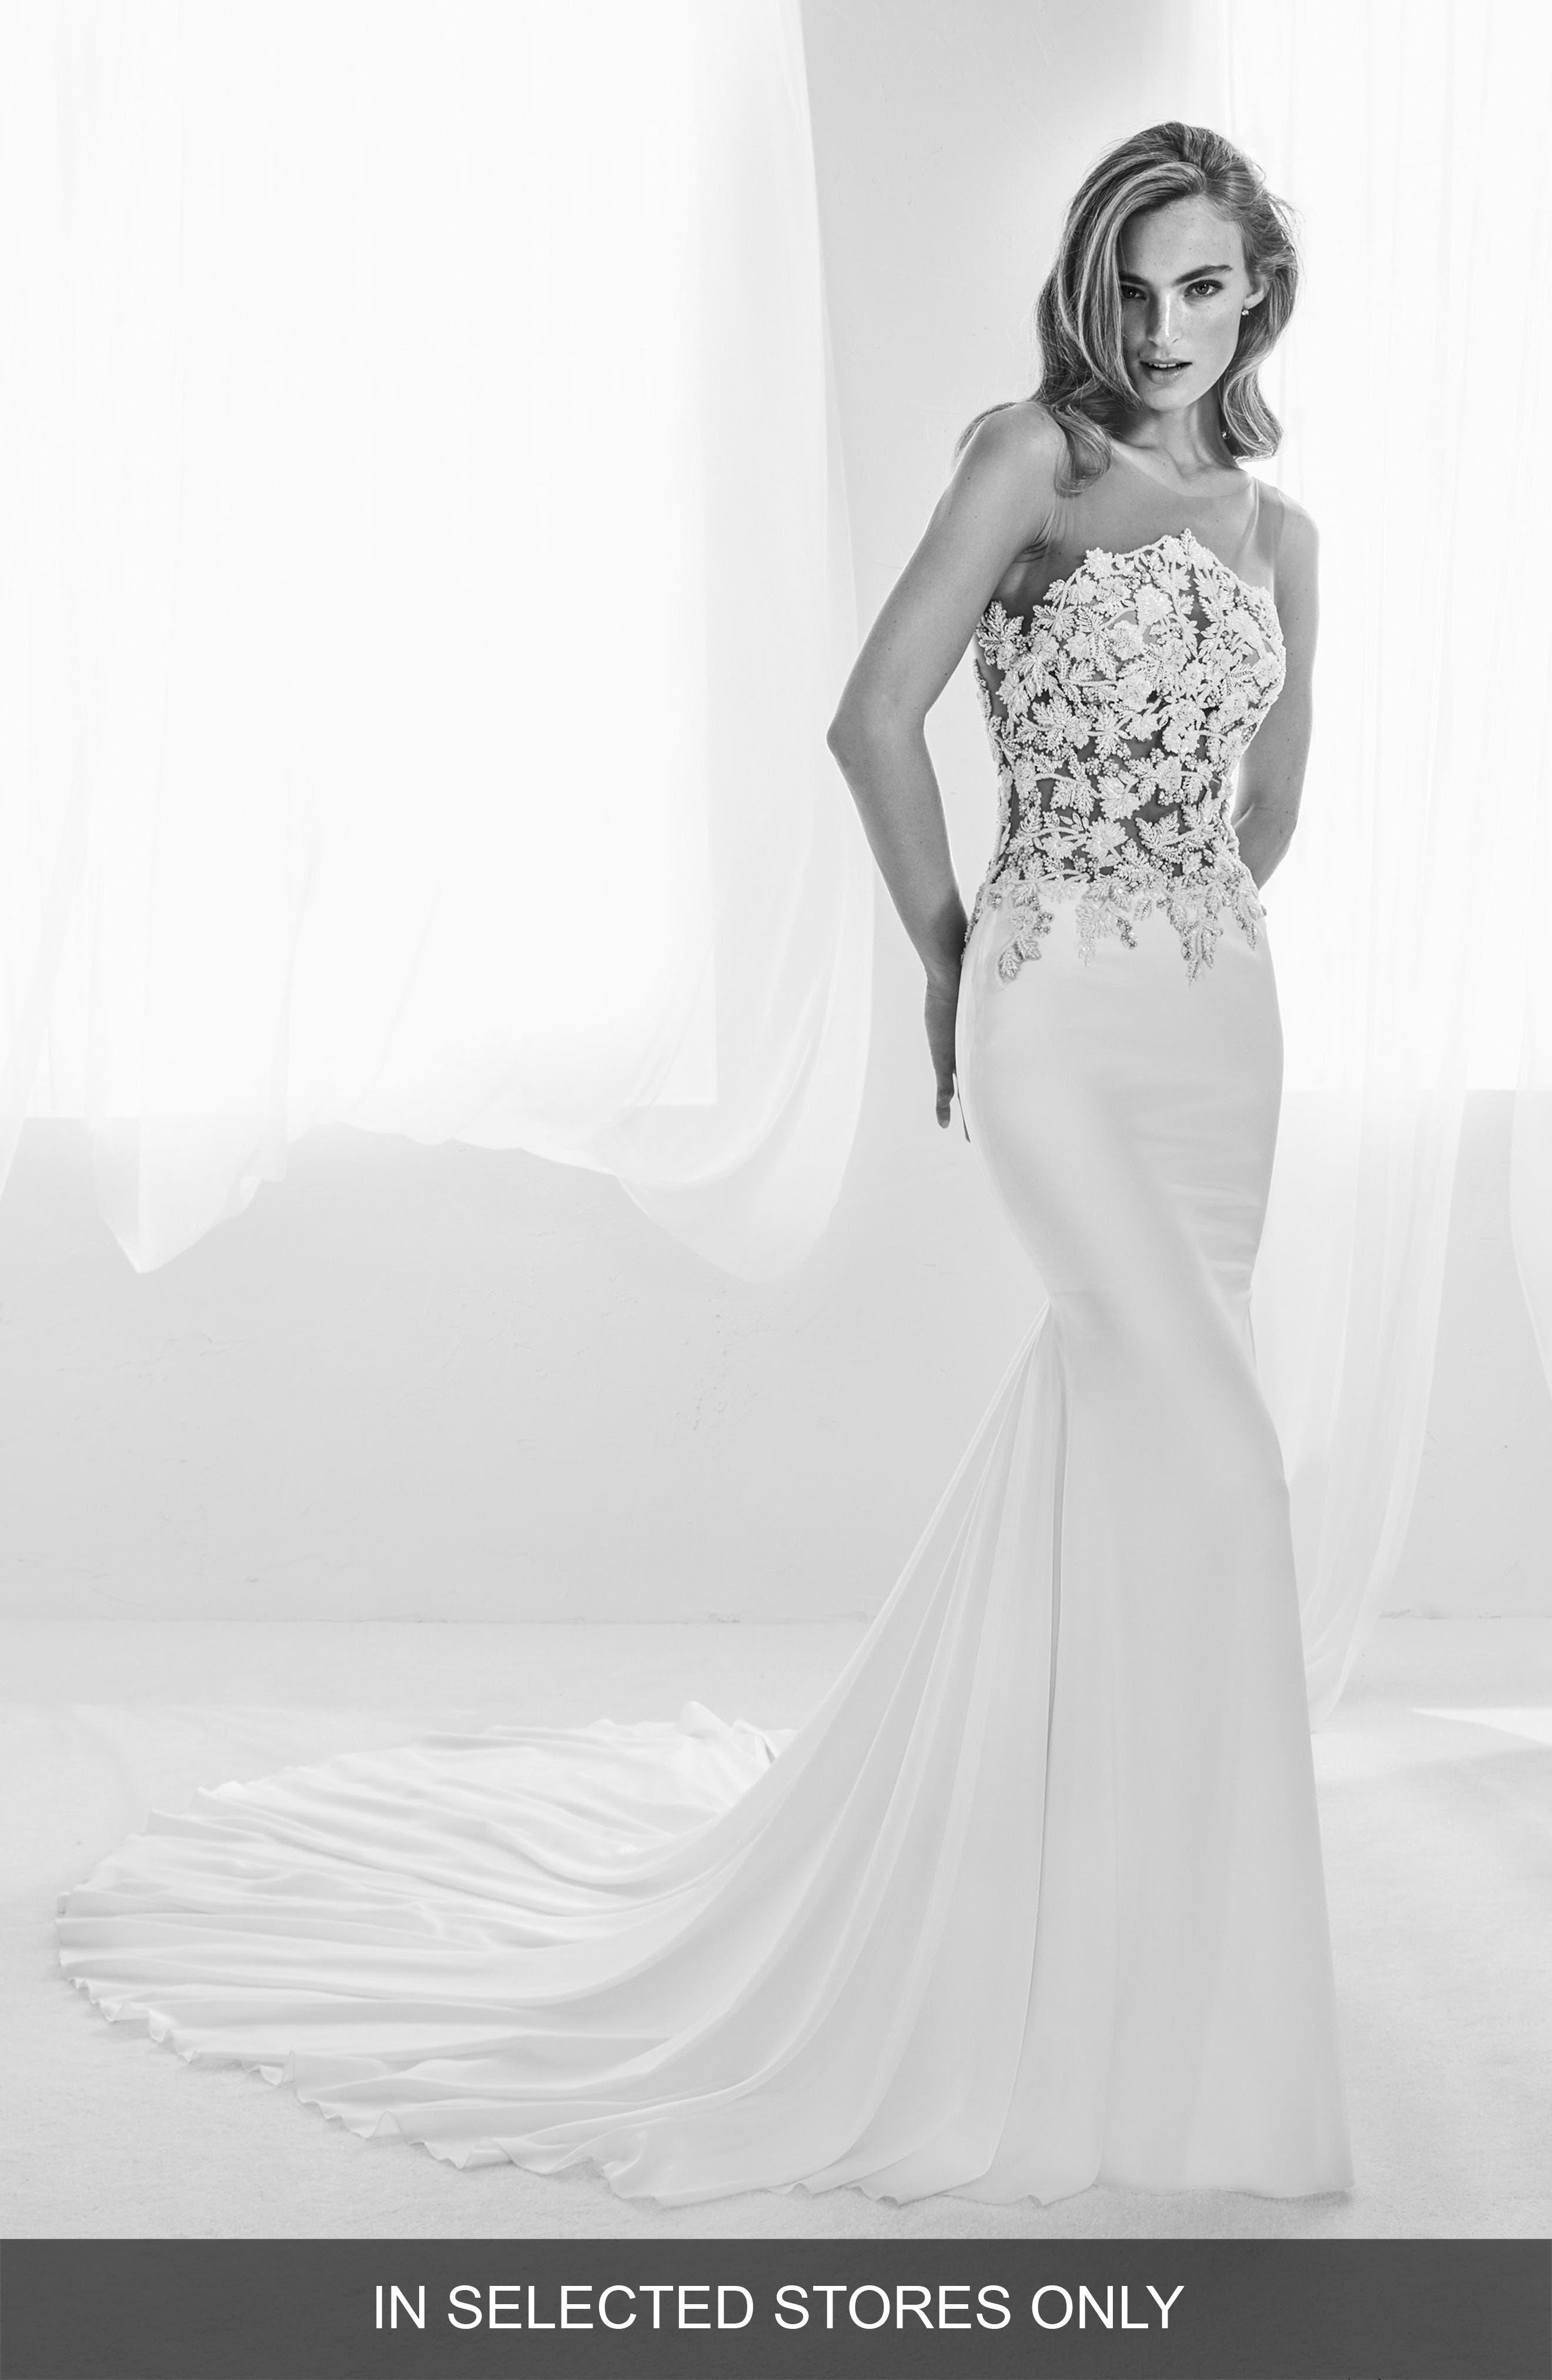 Alternate Image 1 Selected - Atelier Pronovias Ralisa Embellished Mermaid Gown